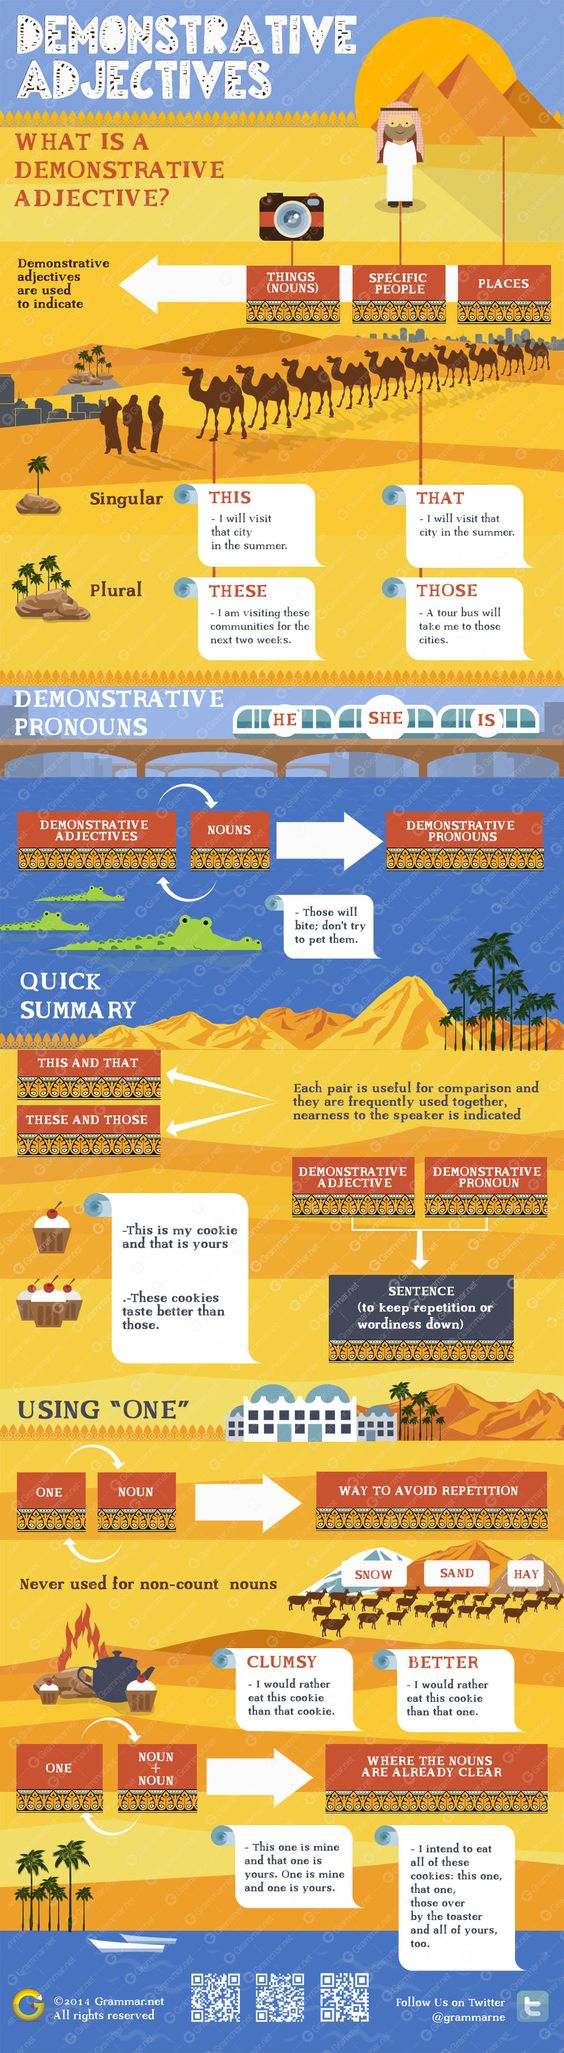 Aprende inglés: adjetivos demostrativos vía: http://www.grammar.net/ #infografia #infographic #education: